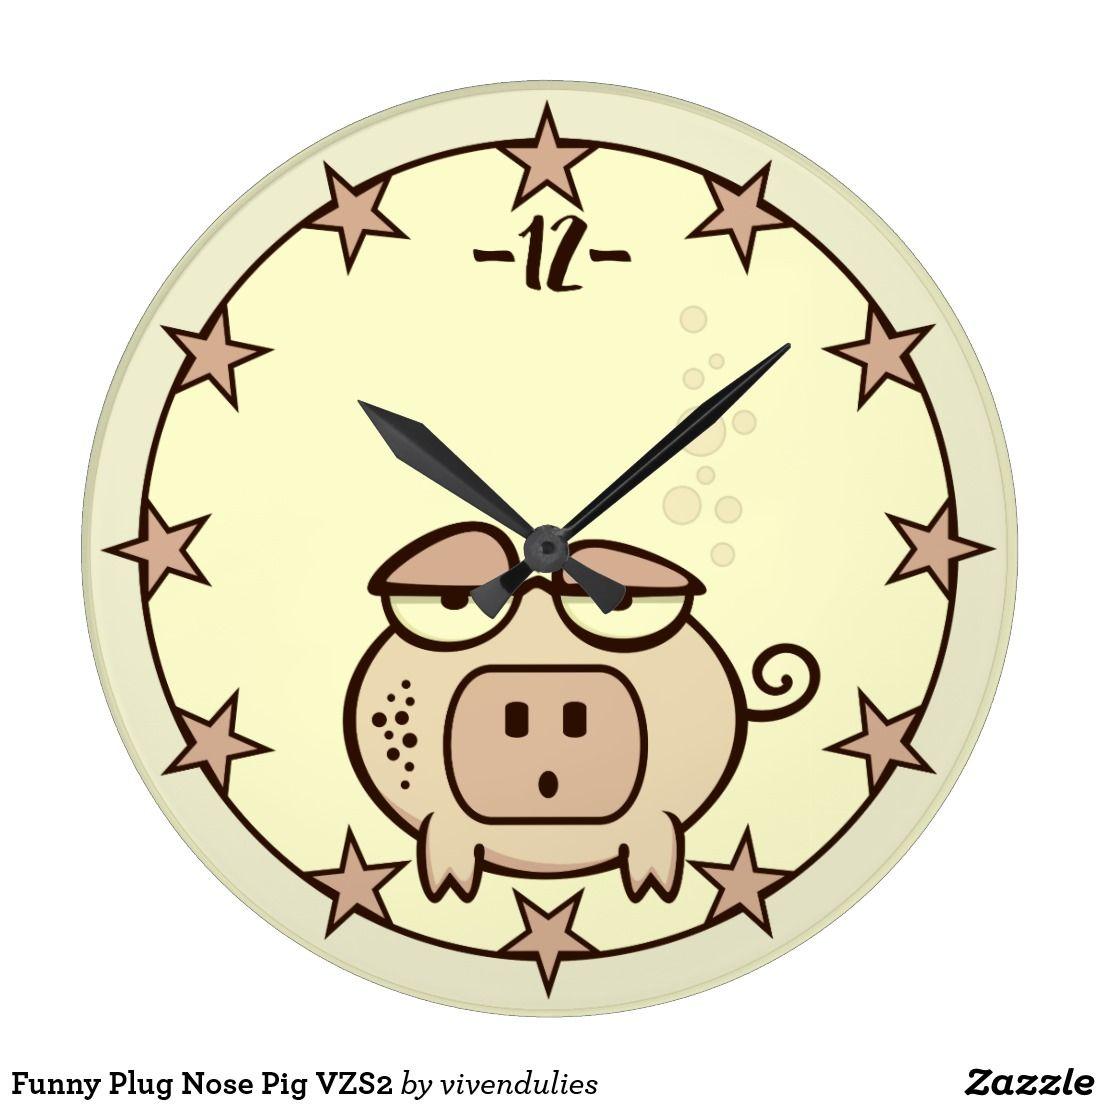 Funny Plug Nose Pig VZS2 Large Clock | Large clock and Clocks